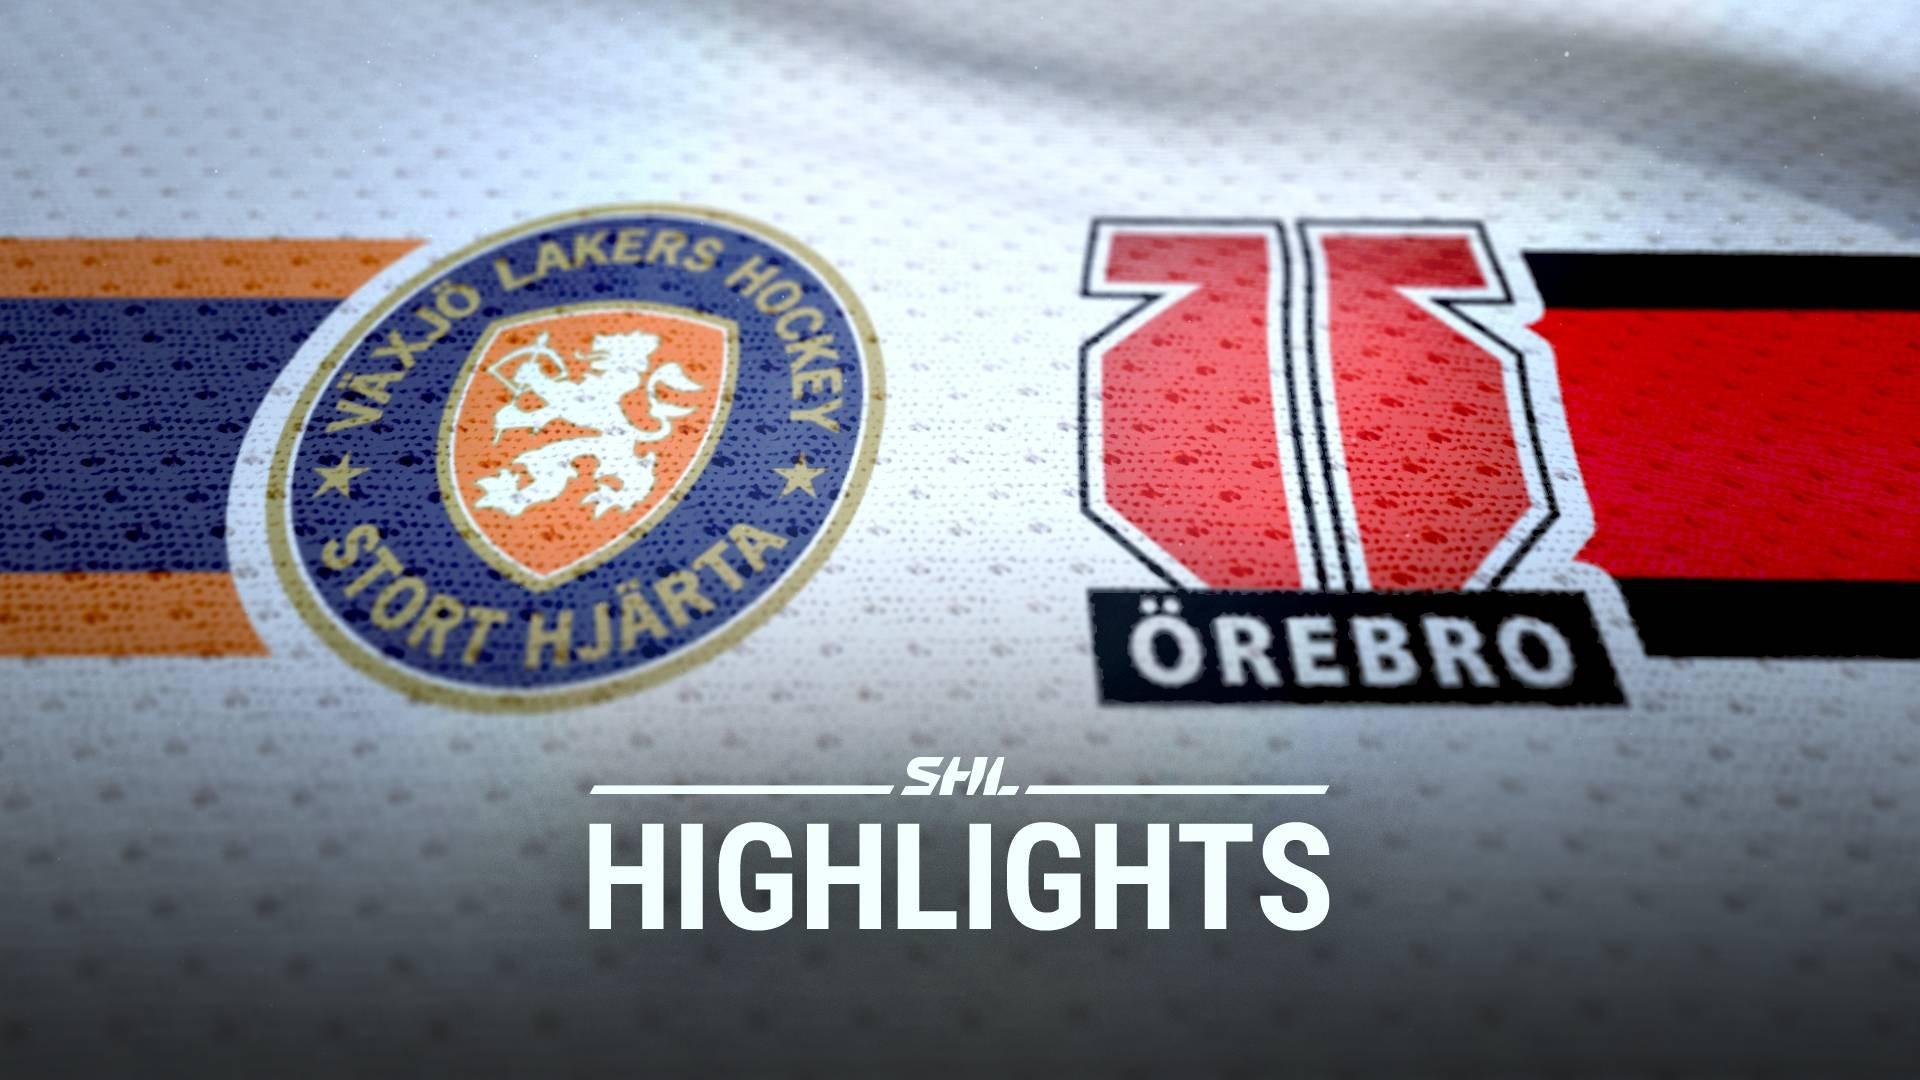 TV: Växjö Lakers - Örebro Hockey